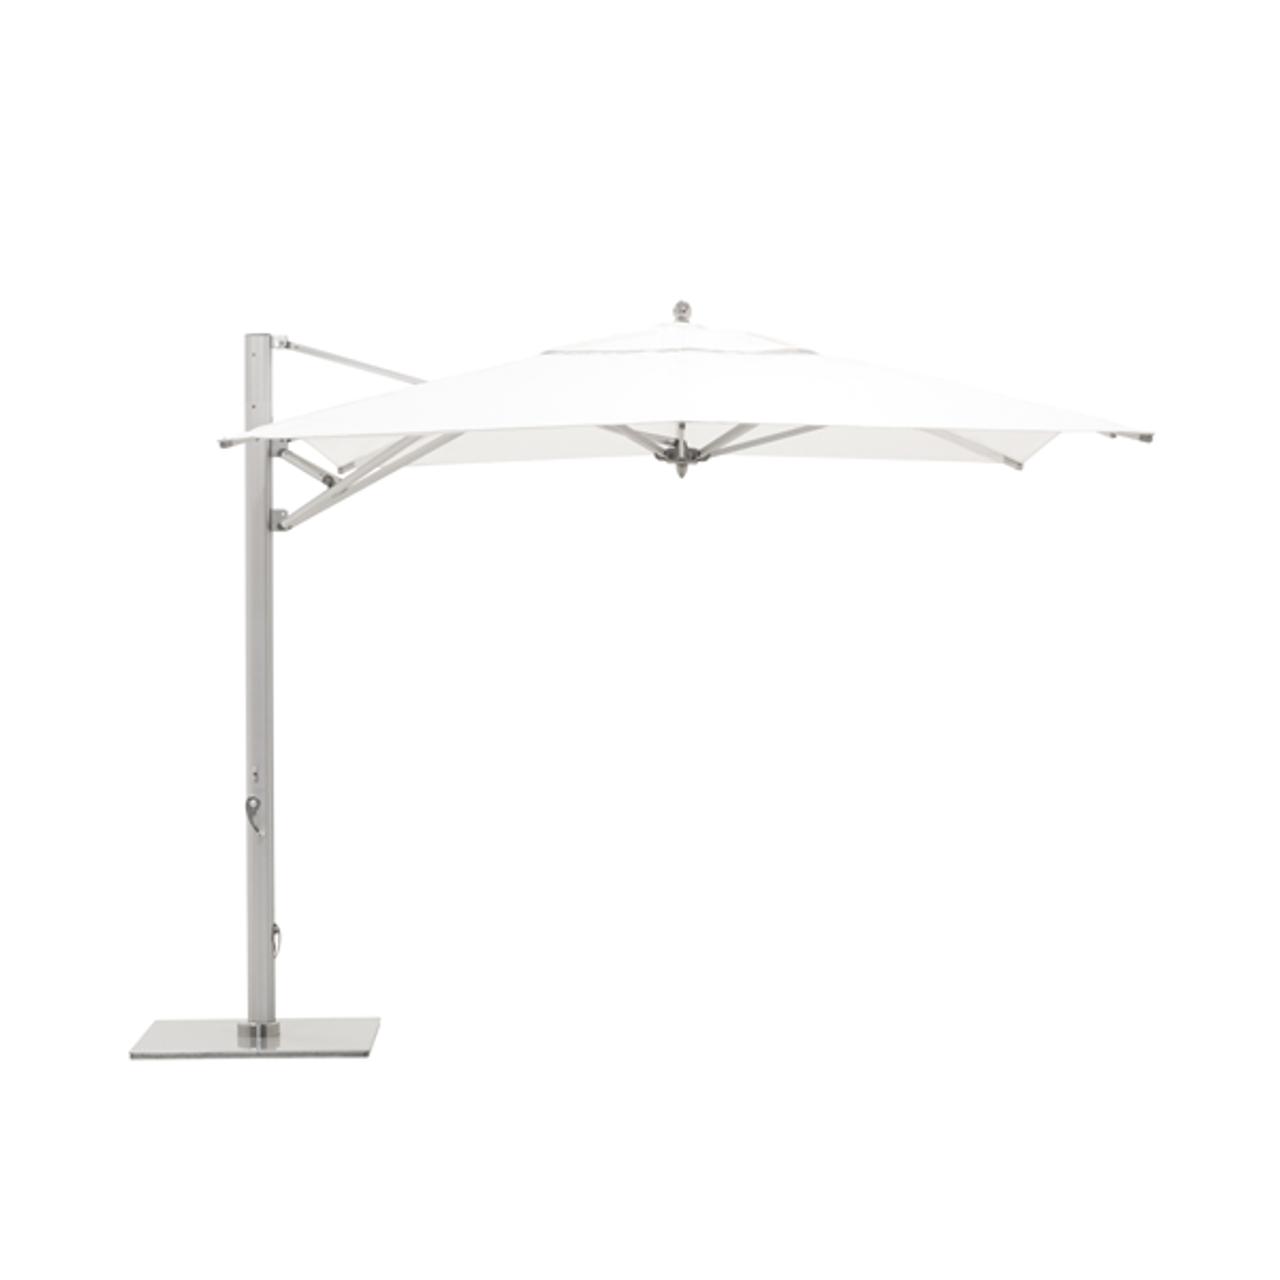 10 X 14 Cantilever Umbrella Modern Patio Furniture